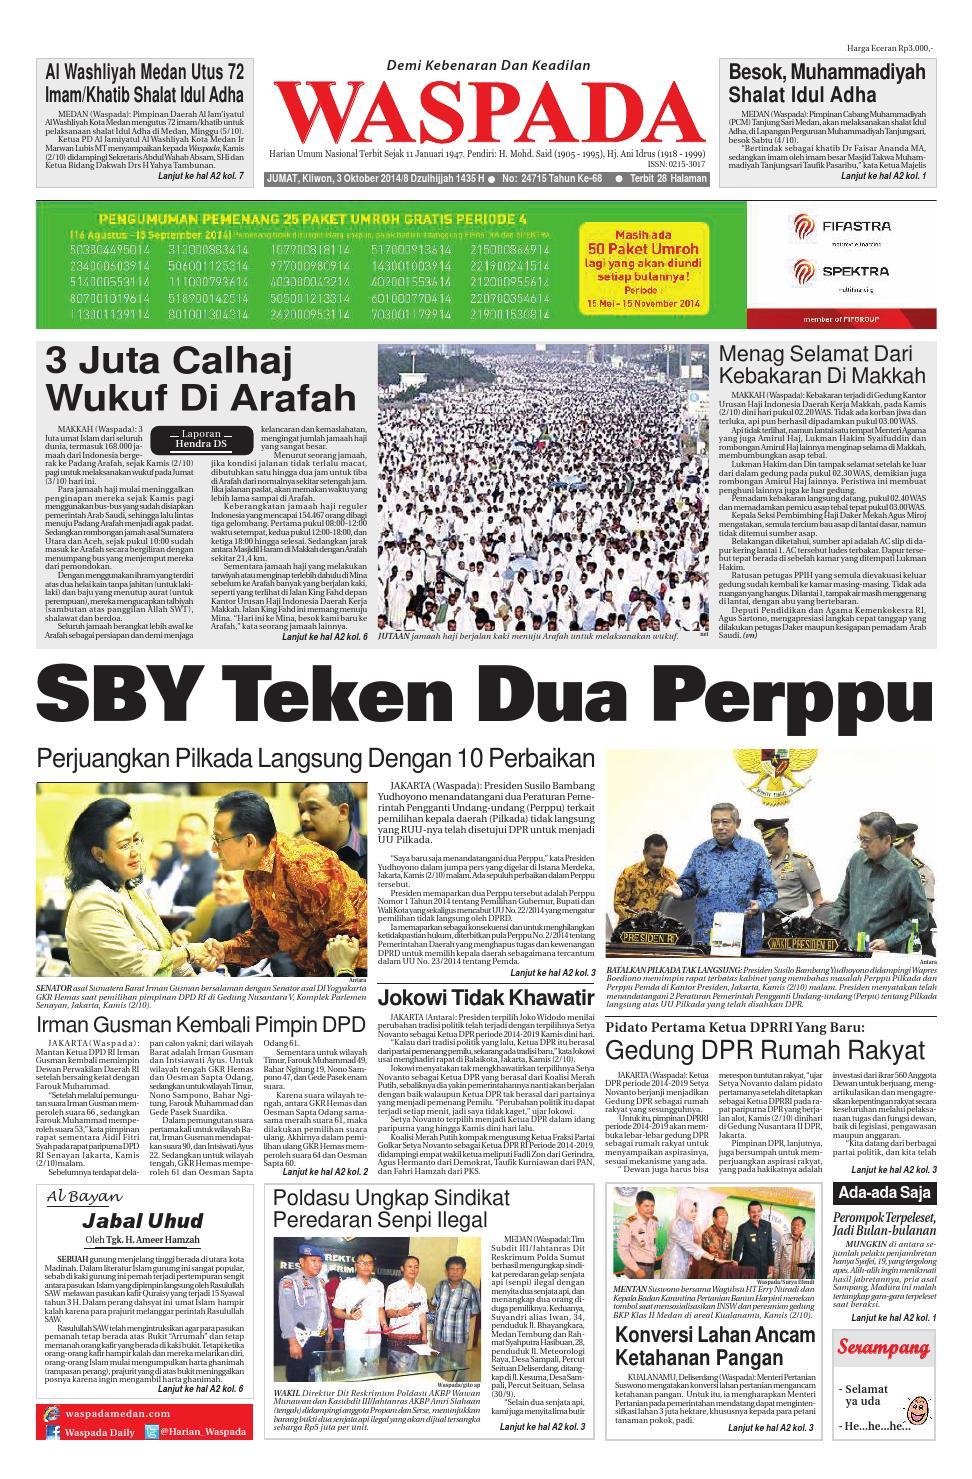 Waspada Jumat 3 Oktober 2014 By Harian Issuu Rkb Bni Tegal Kranjang Buah Nur Fashion And Art